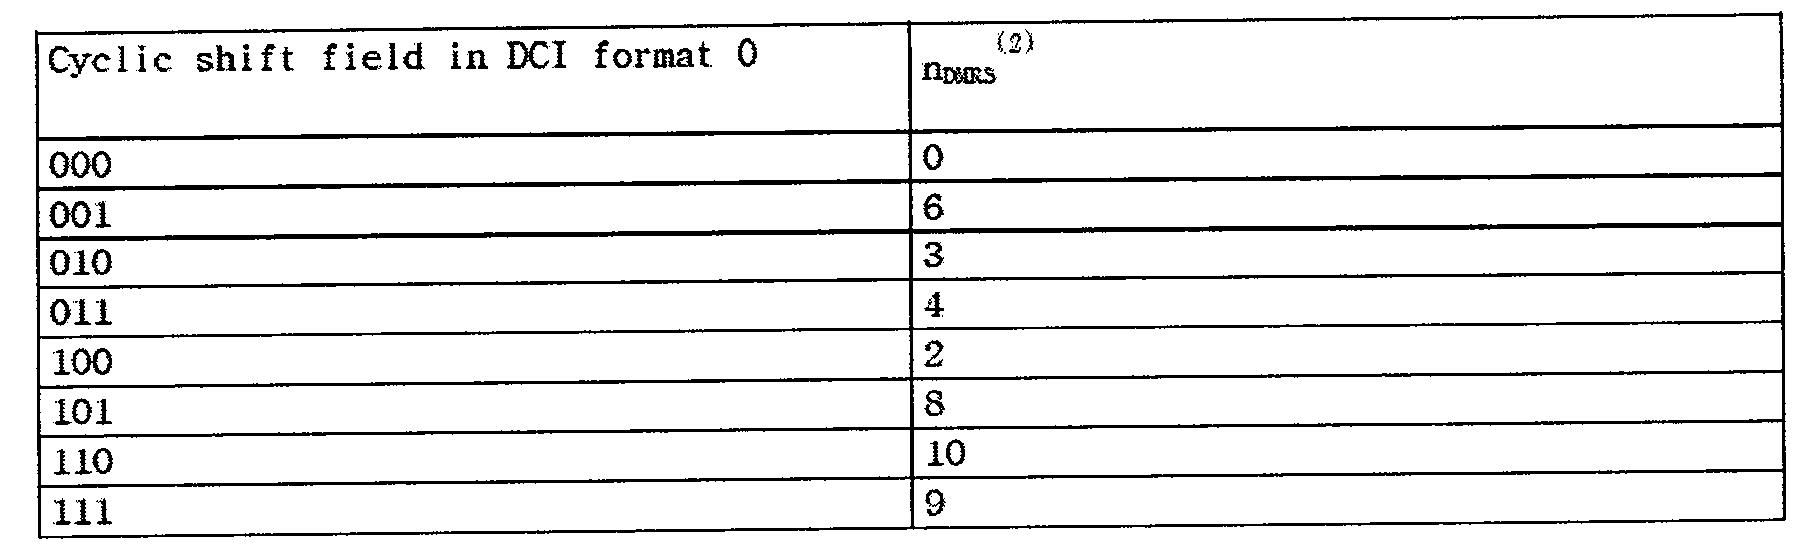 Figure 112011500951185-pat00023